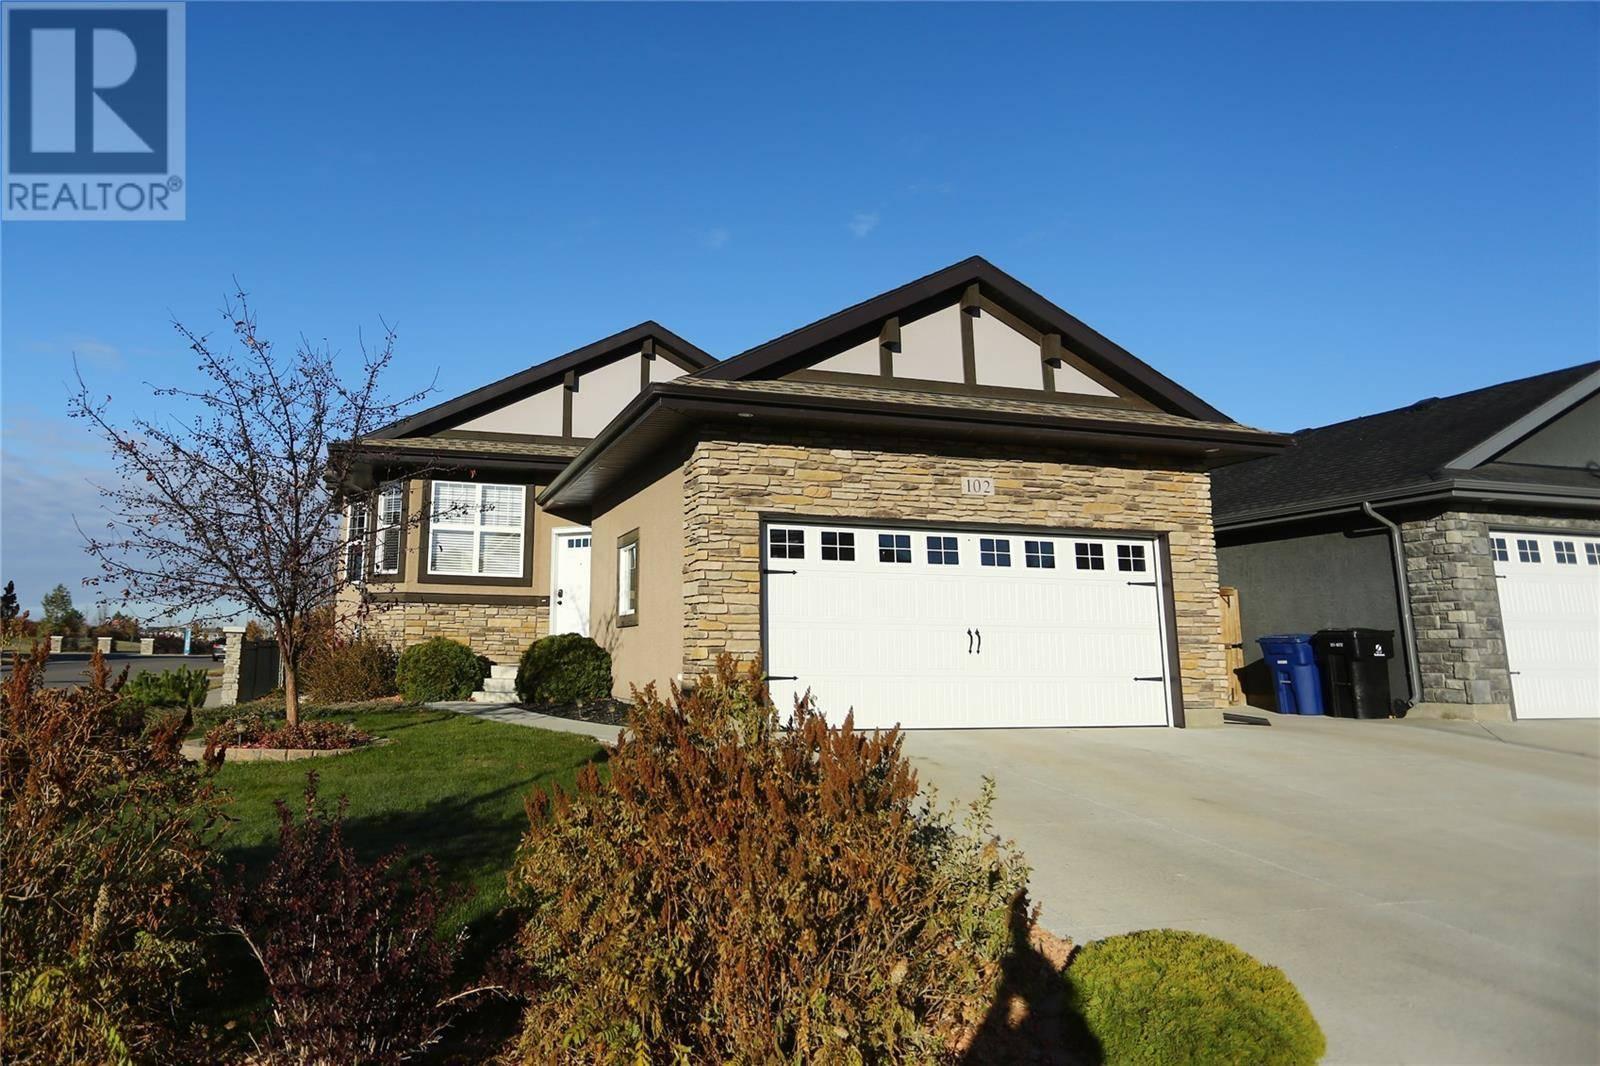 House for sale at 102 Snell Cres Saskatoon Saskatchewan - MLS: SK781457